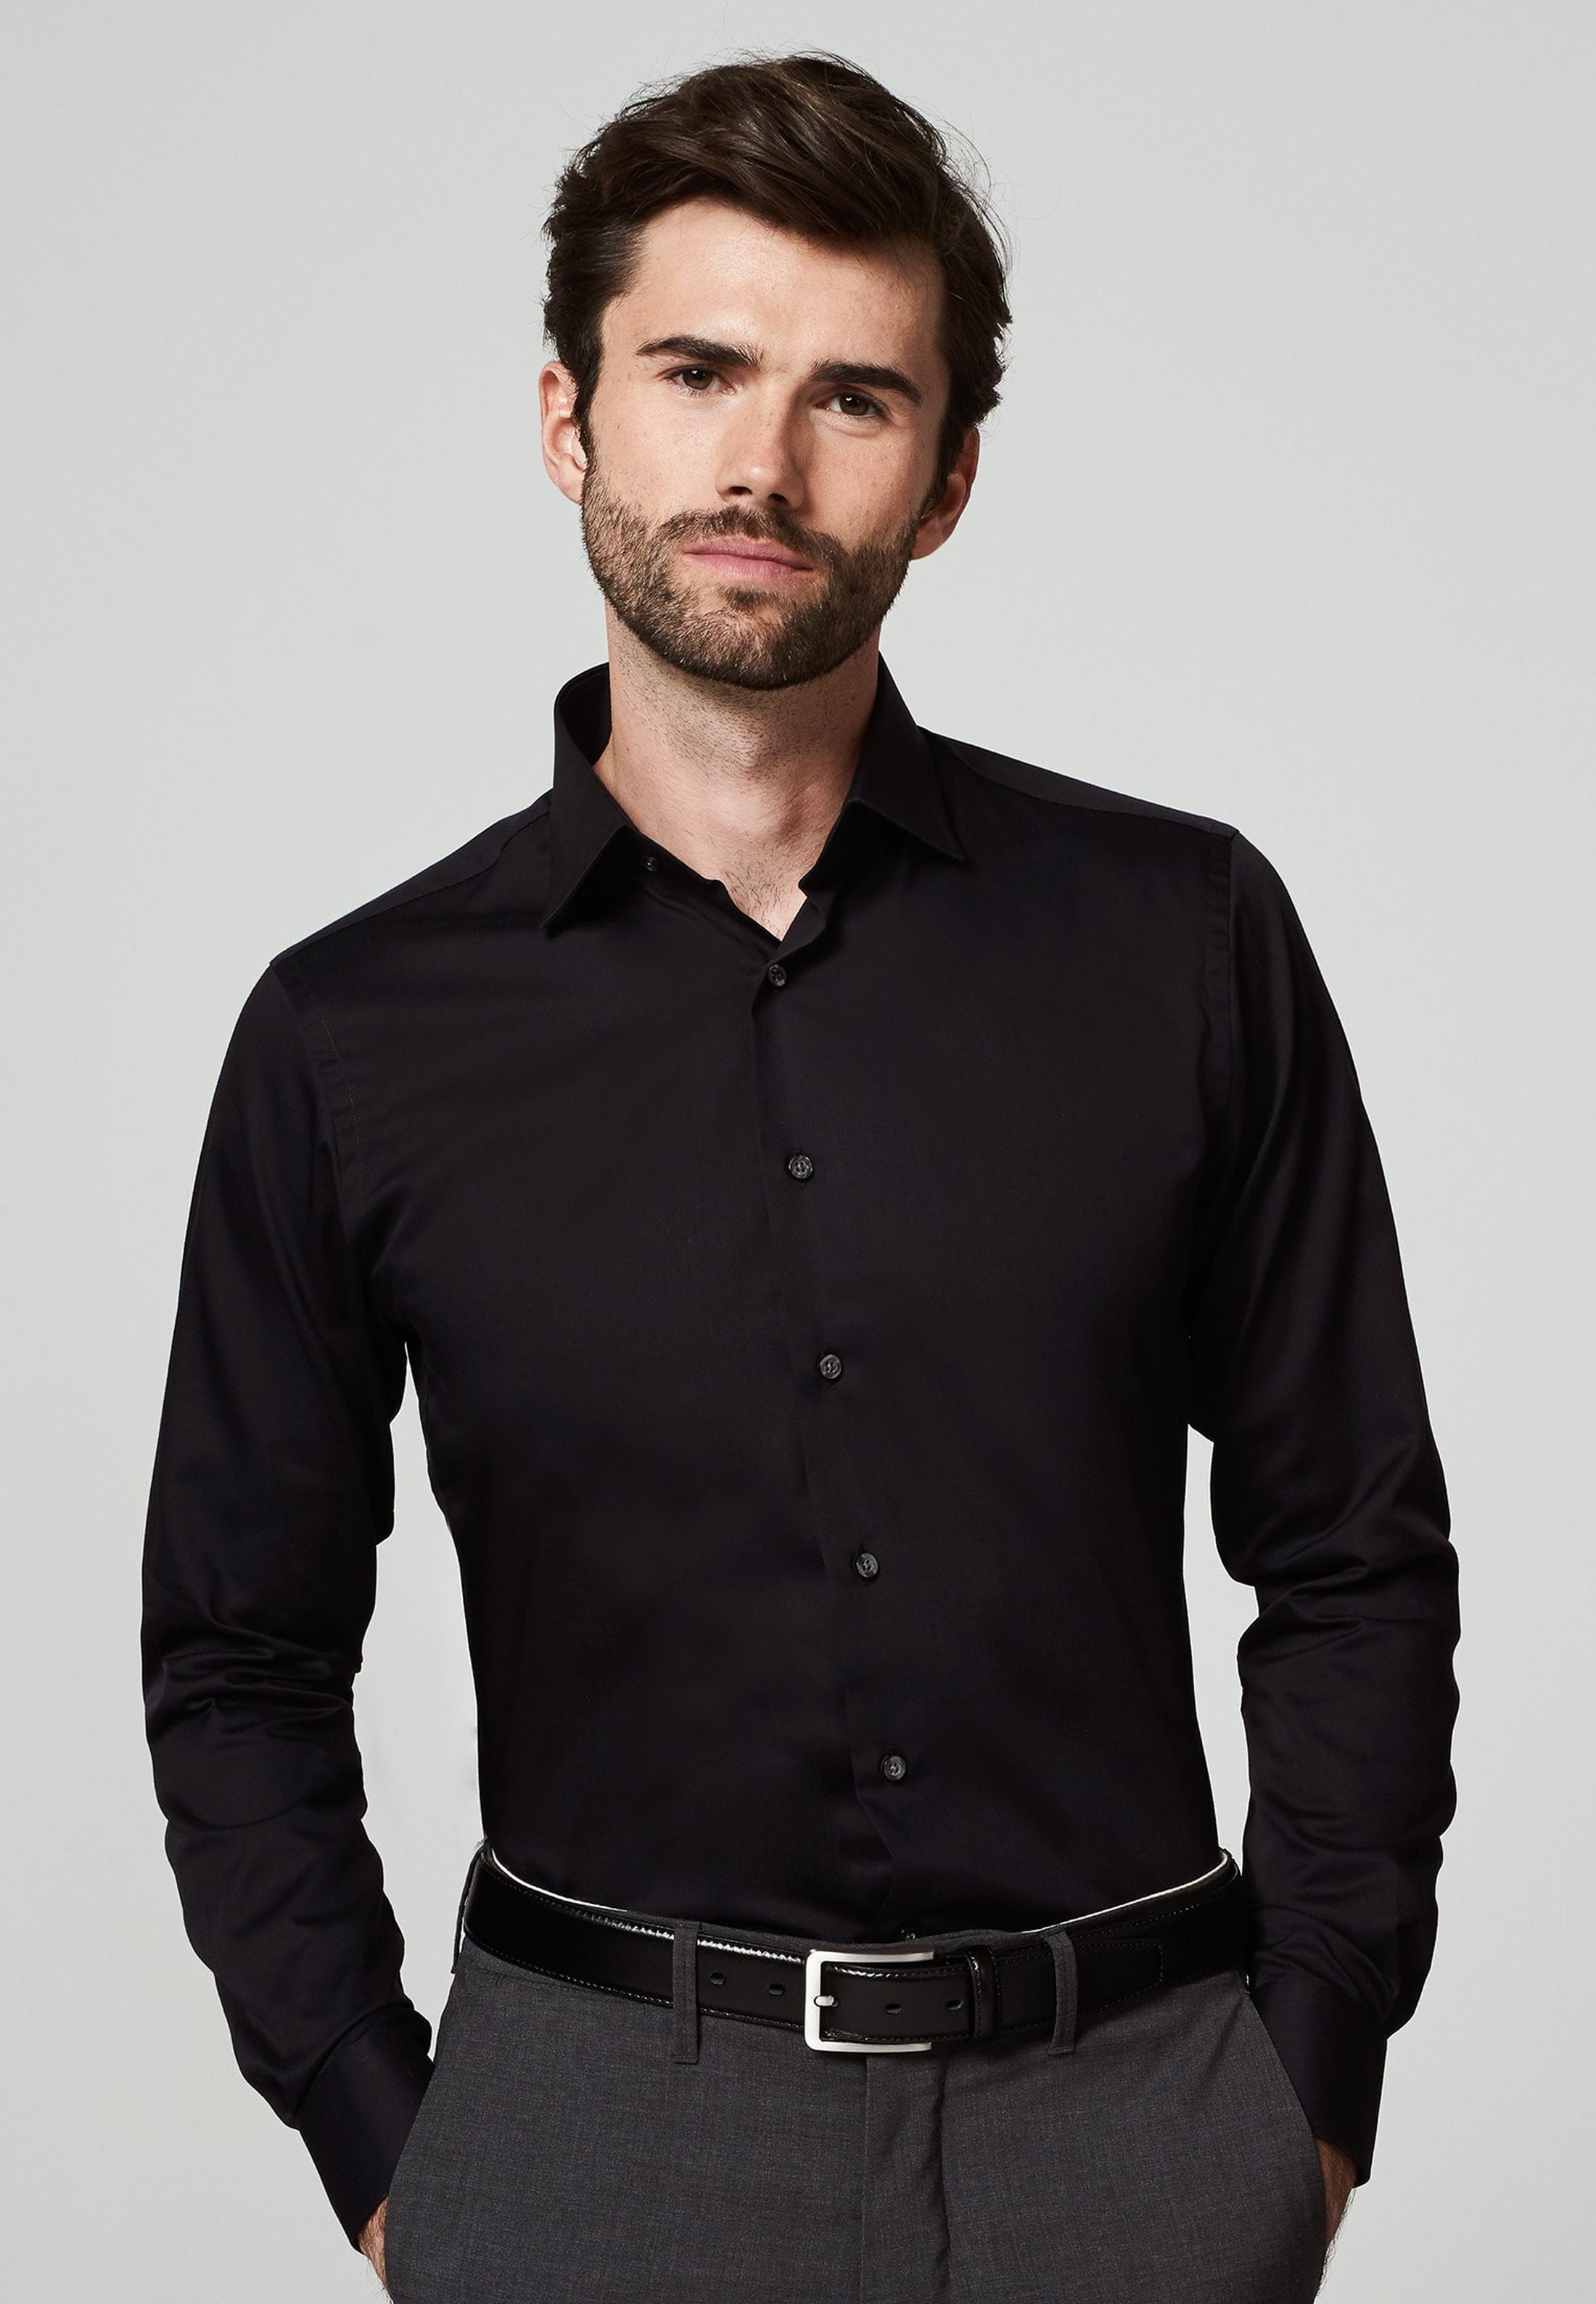 Michaelis Overhemd Slim Fit Zwart foto 1